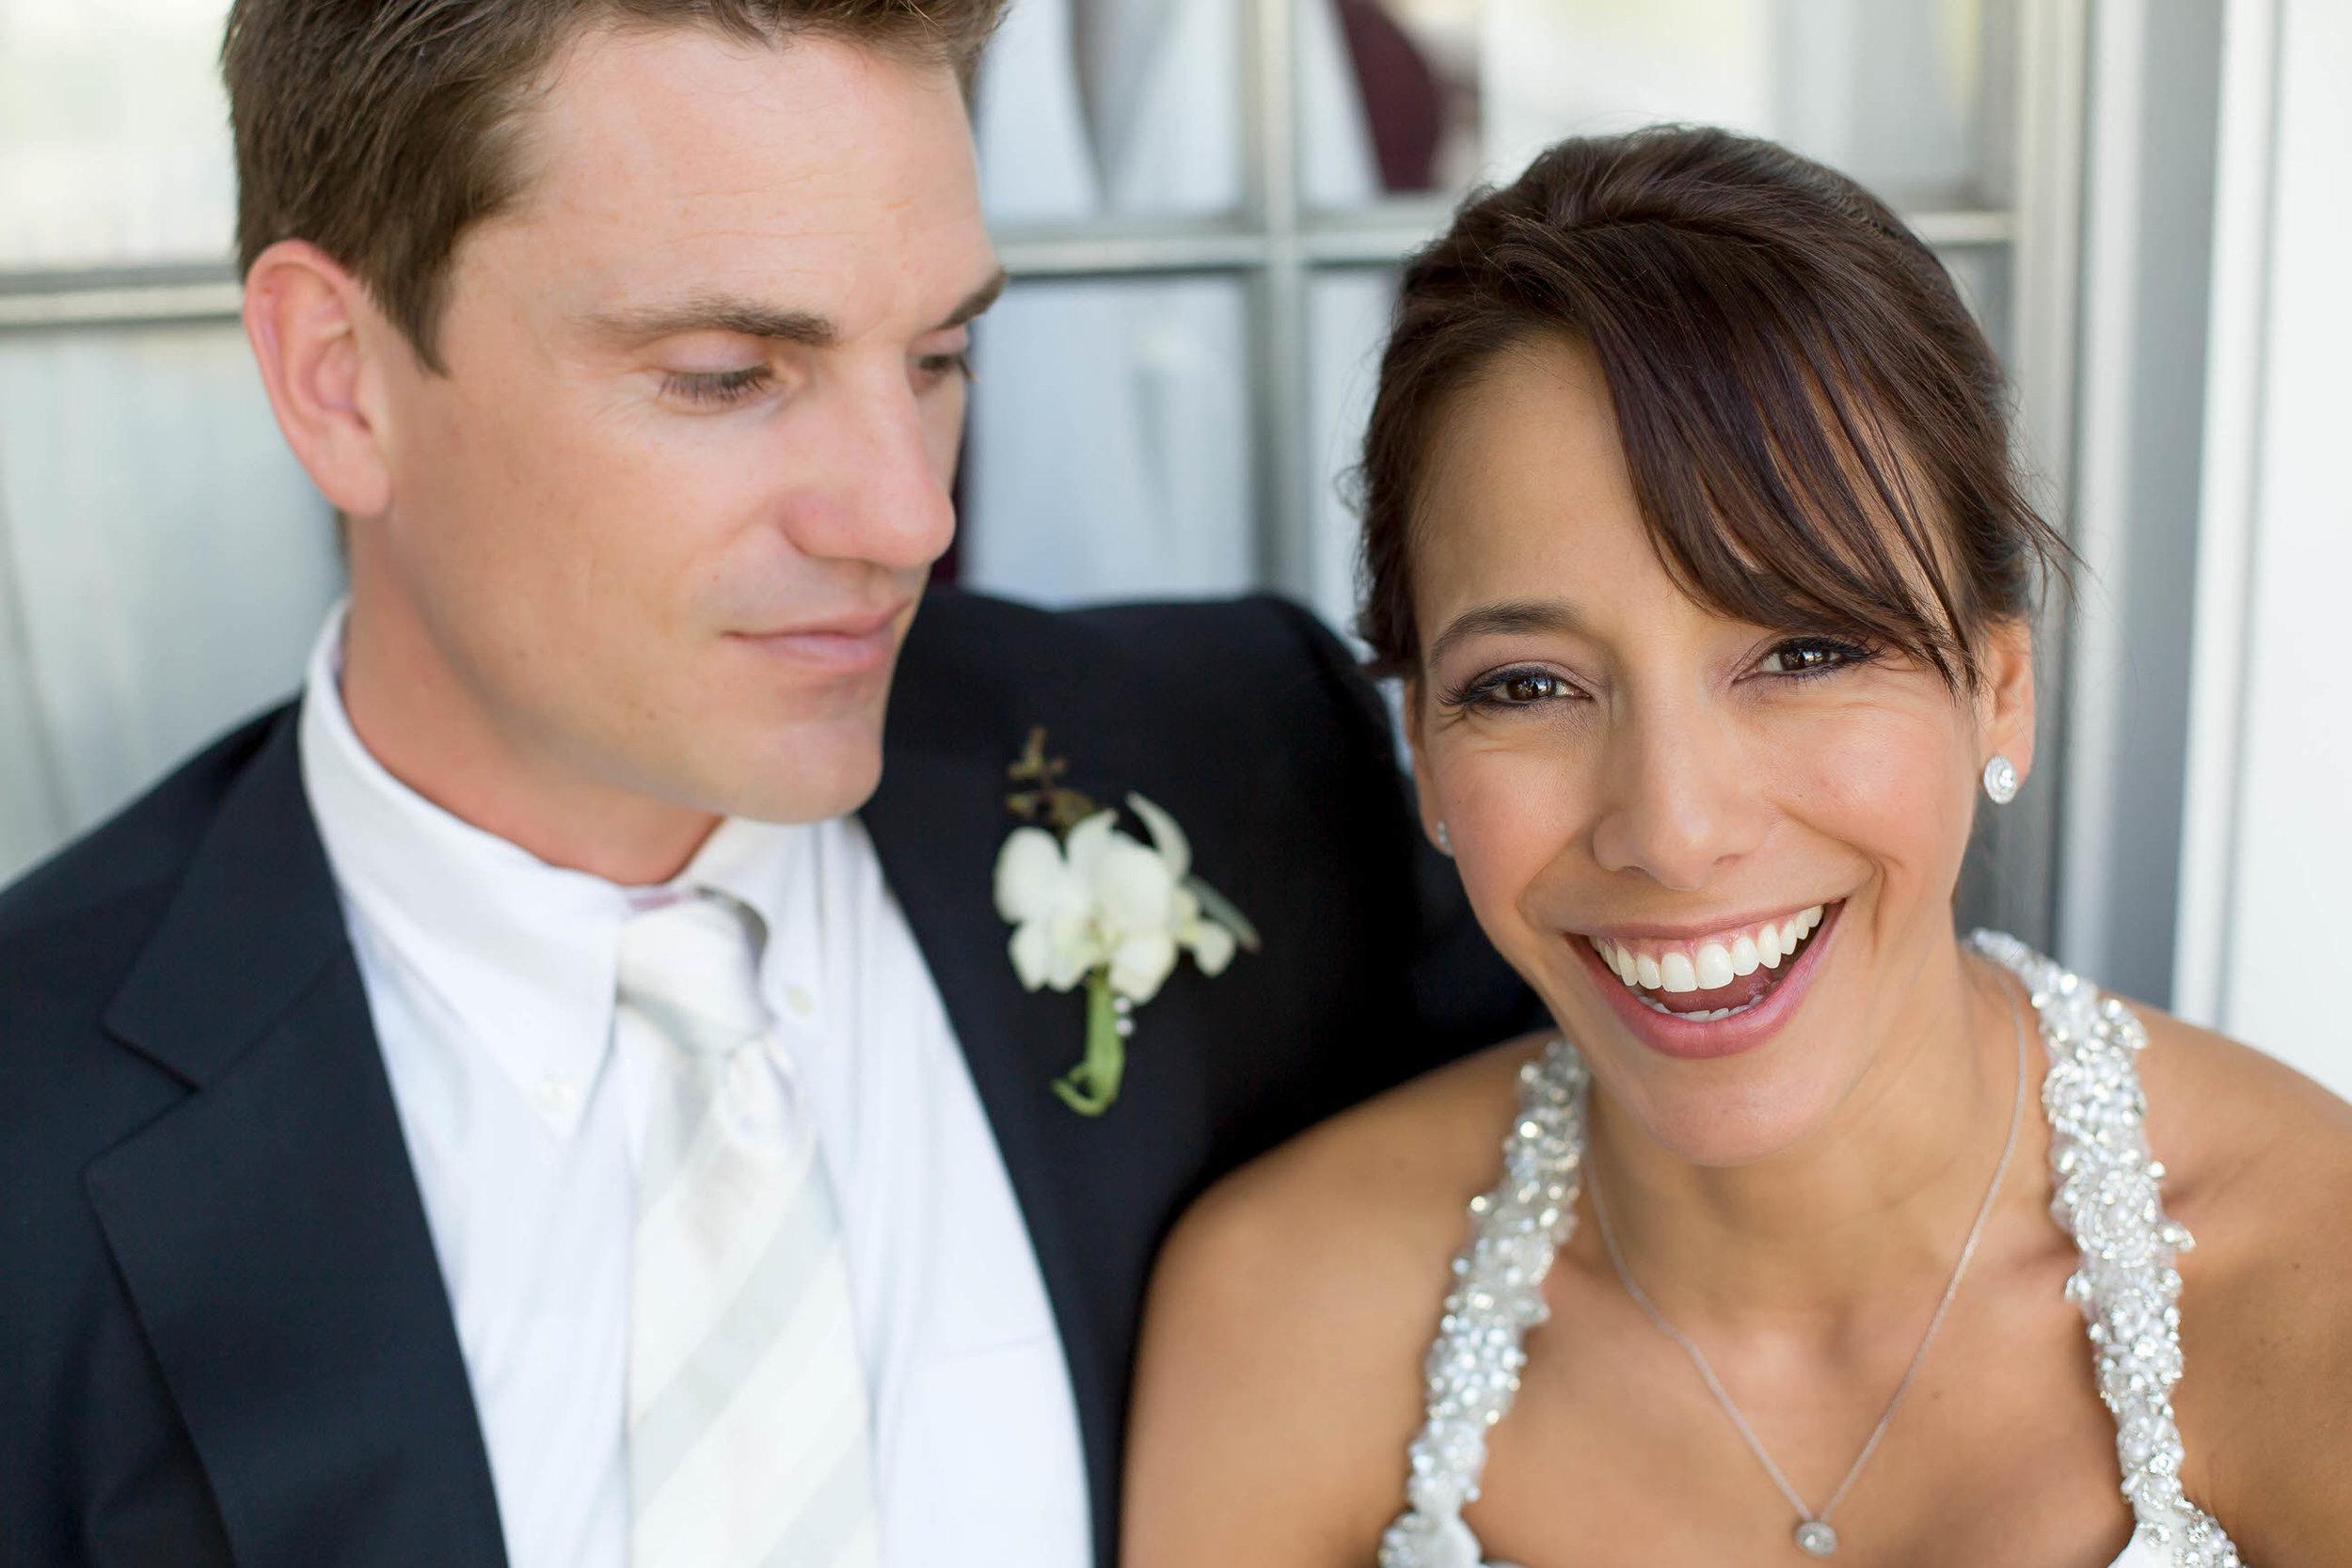 bride_laughing_florida_wedding_photographer_tiny_house_photo.jpg